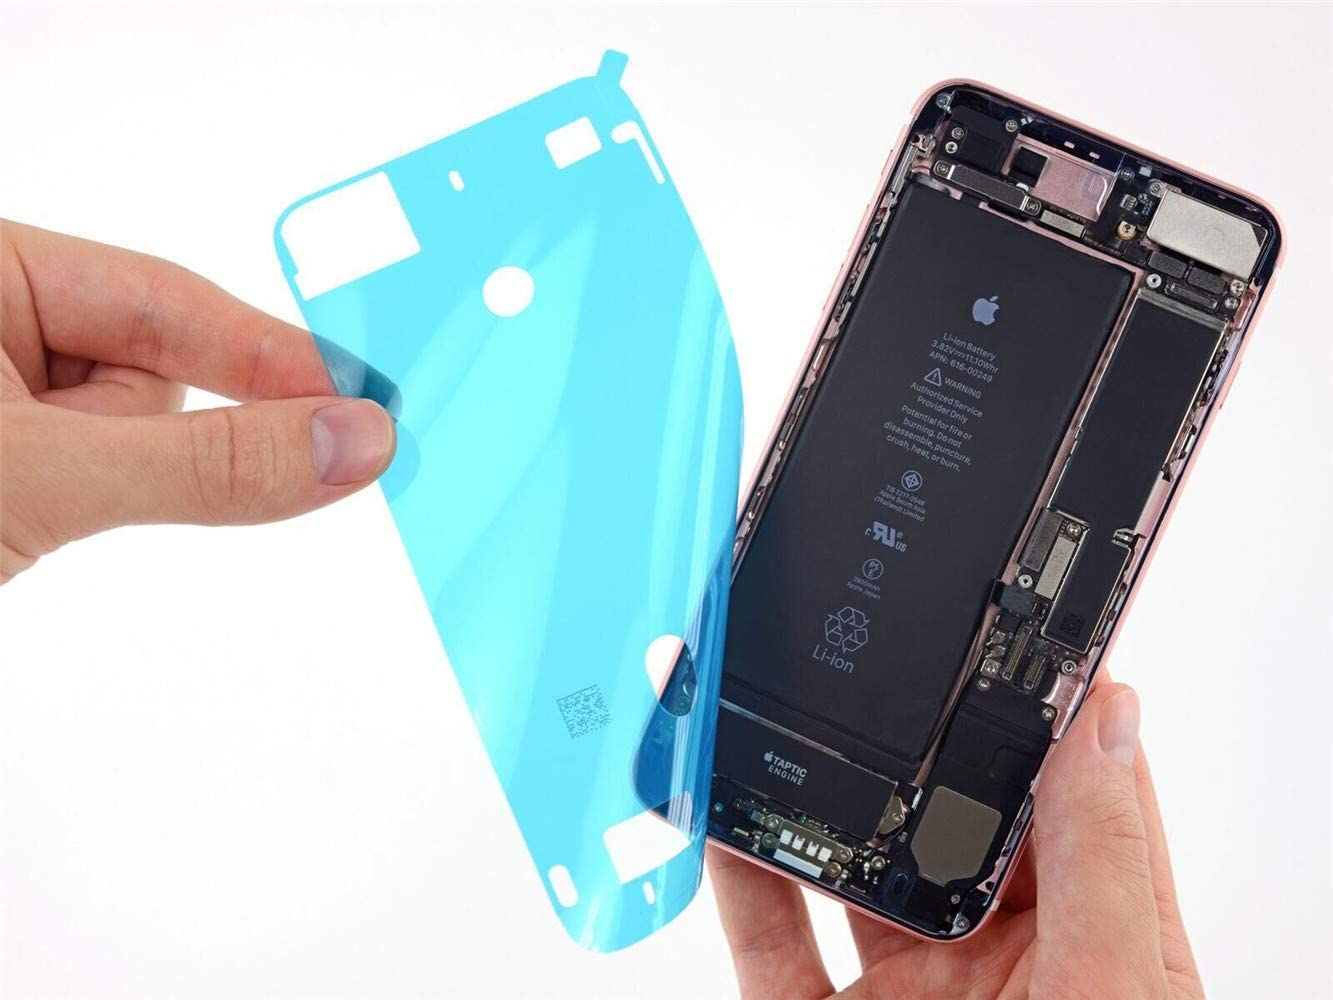 Amazon Com Screen Adhesive Strips Pre Cut Waterproof Seals For Iphone 6 6s Gvkvgih Water Liquid Damage Repair Adhesive Replacement 2pack For Iphone 6 6s